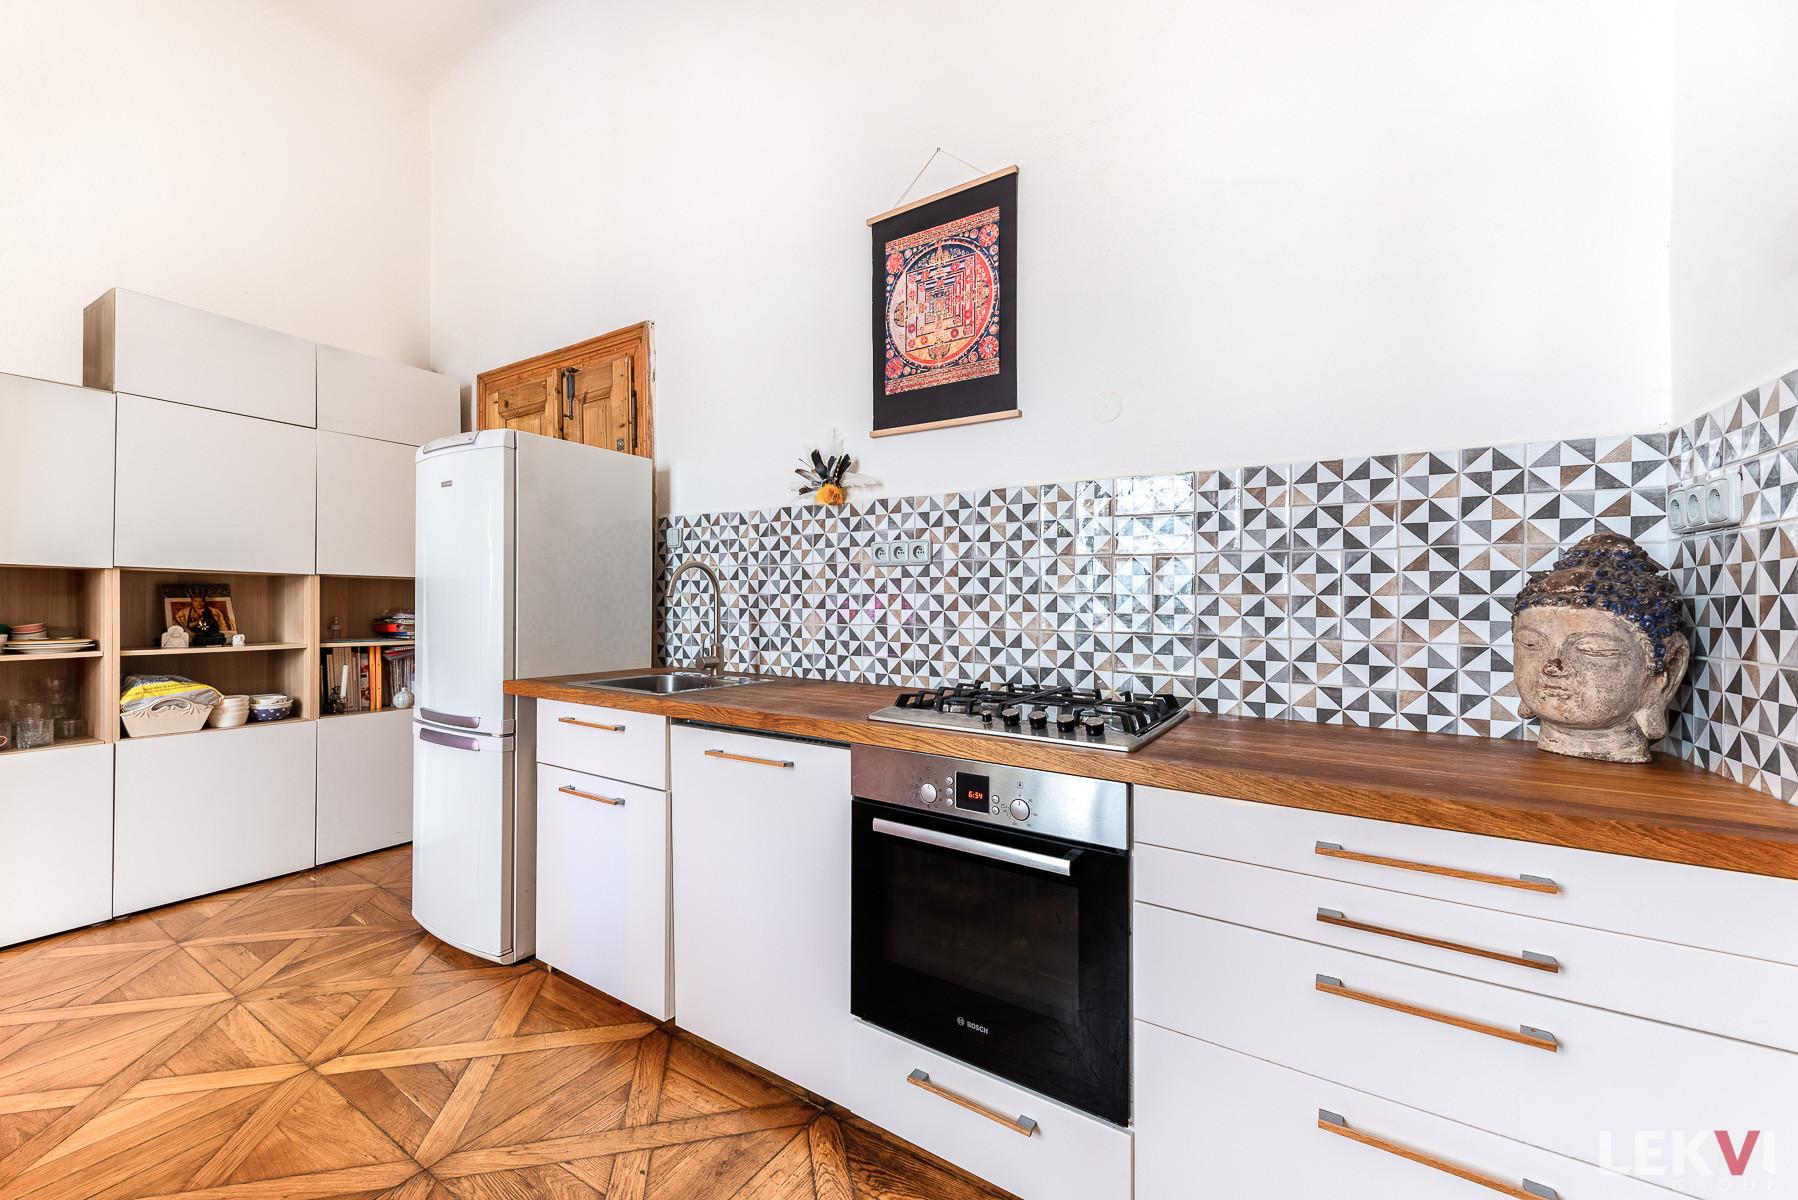 Prodej bytu 4+kk, 87 m2 - Jakubská, Praha 1